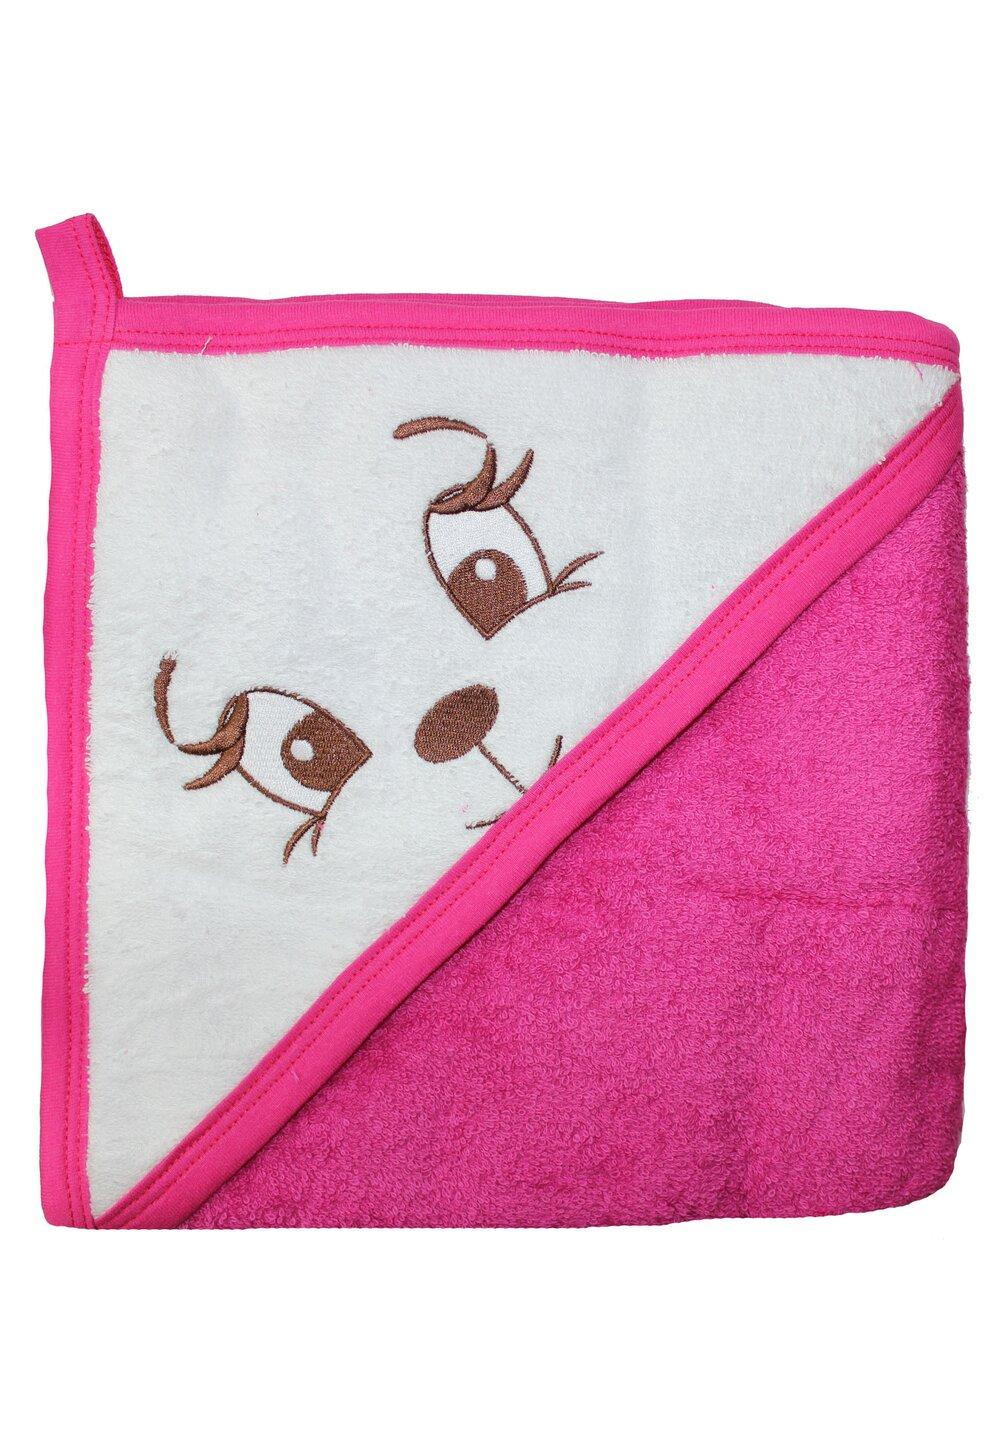 Prosop bumbac, roz inchis, catelusa, 80 x 100 cm imagine